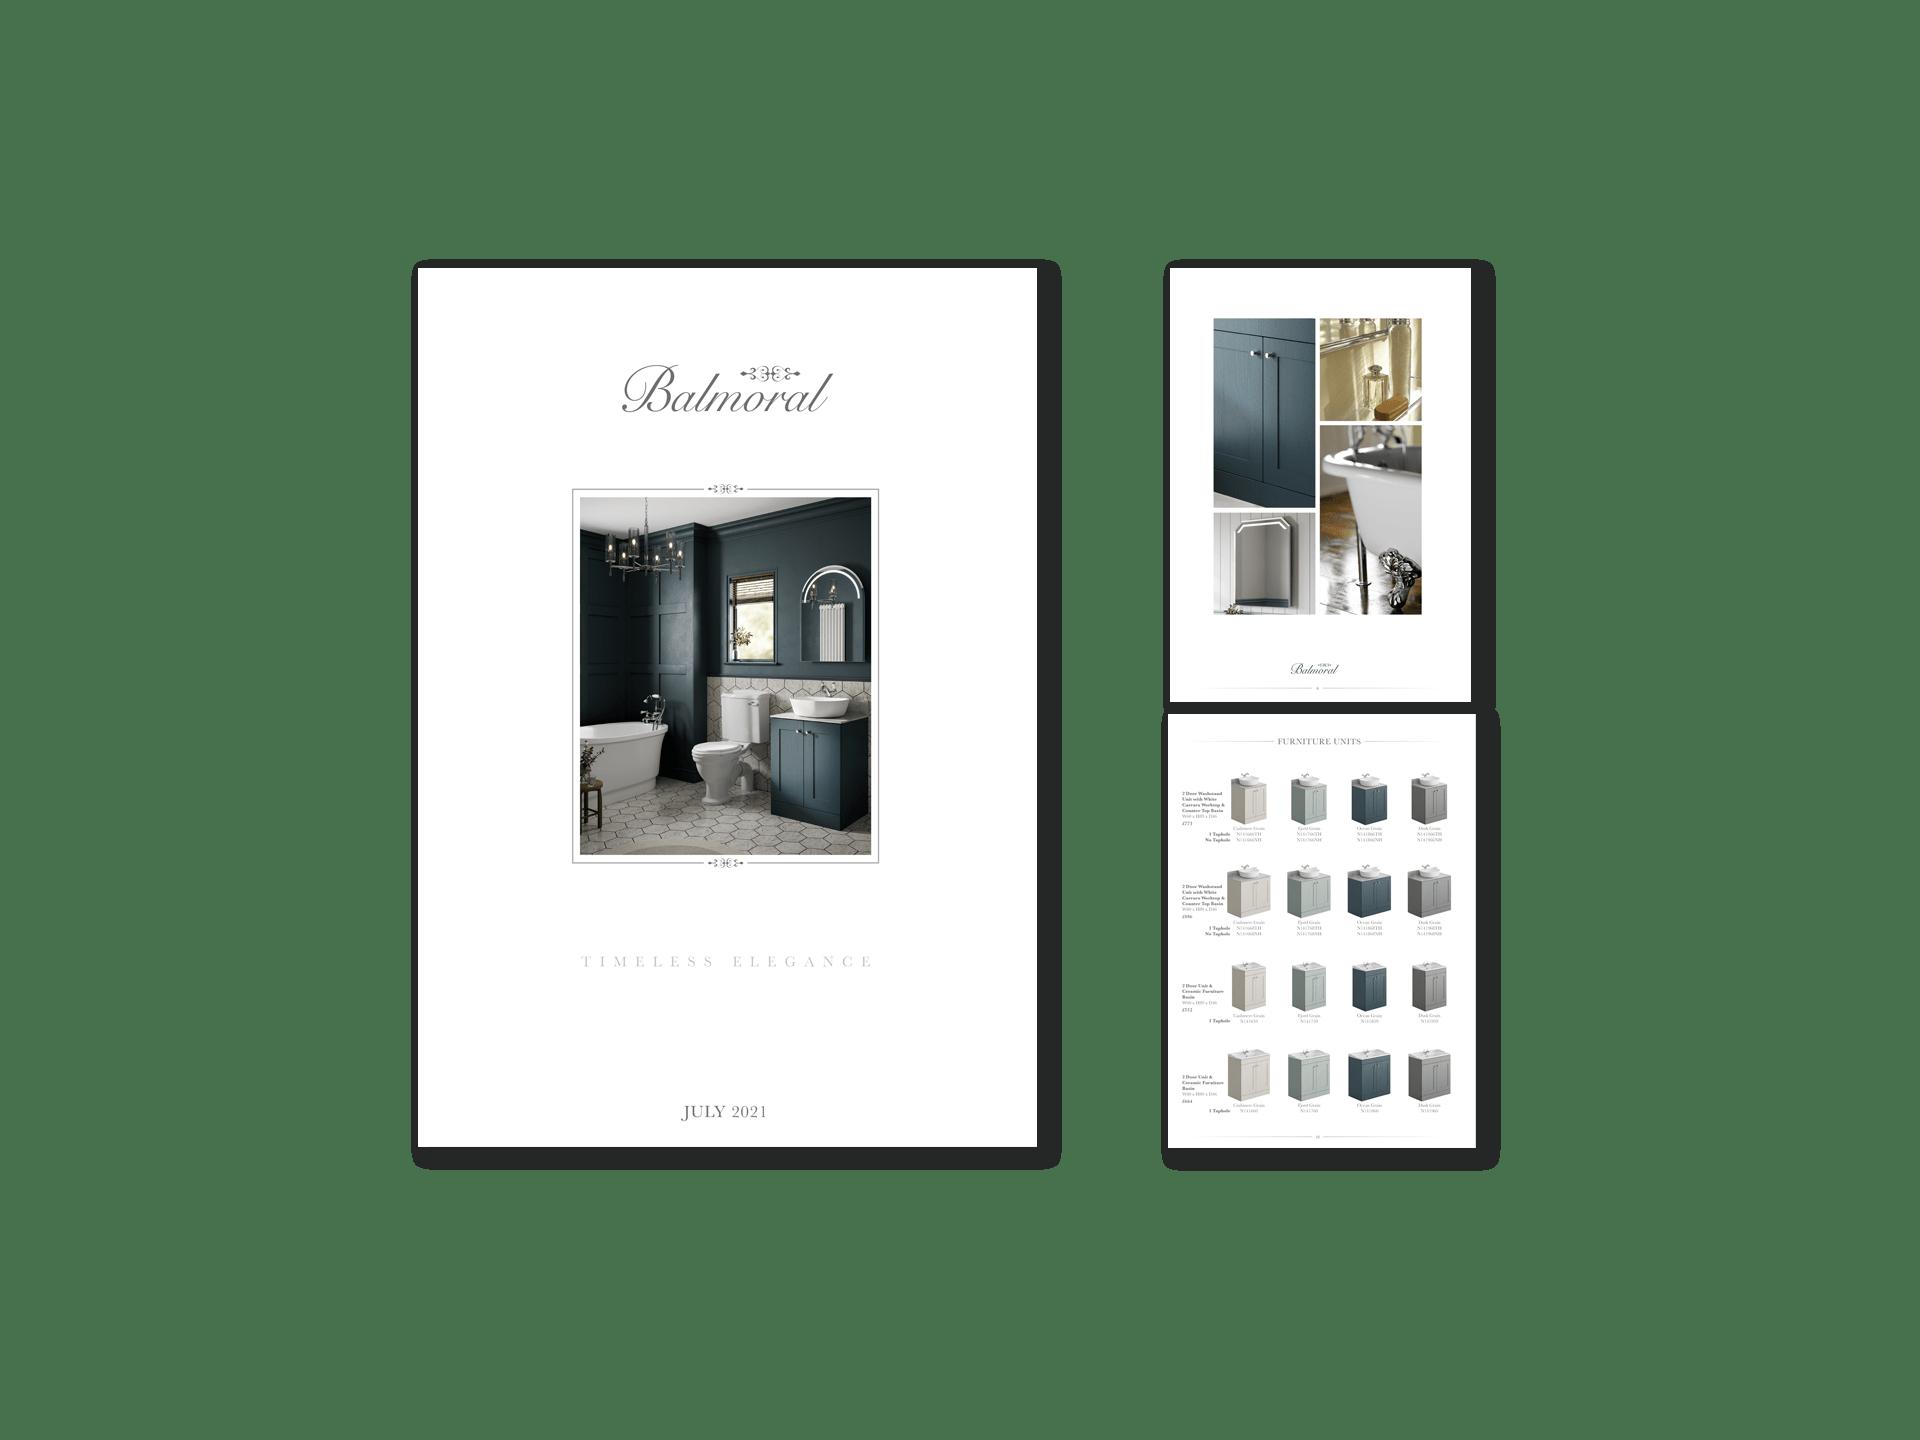 2021 July Balmoral brochure